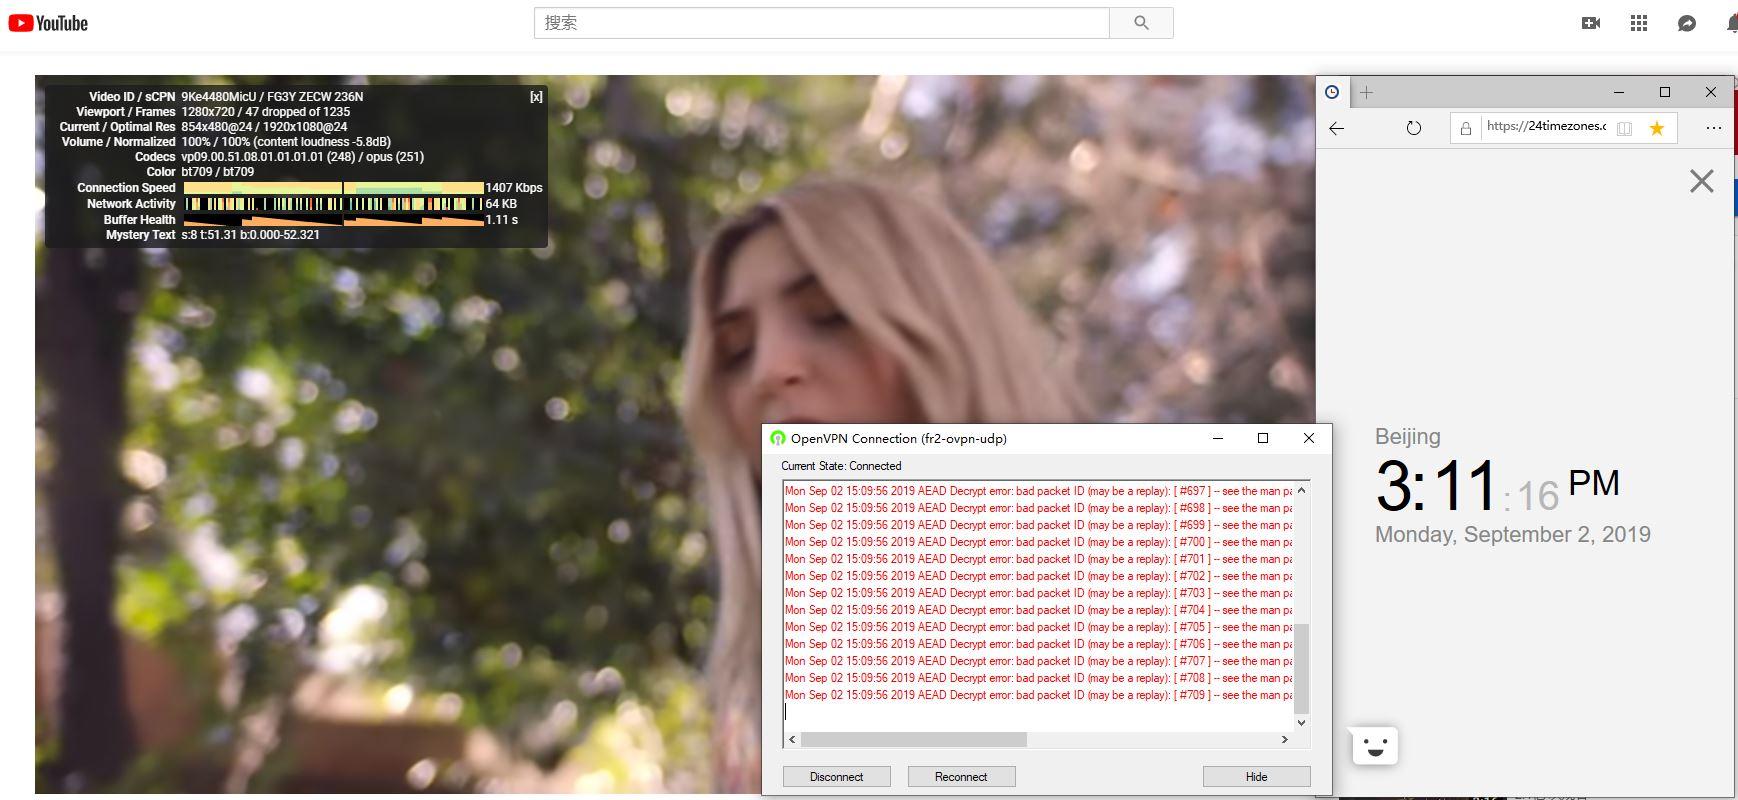 ivacyvpn windows fr2-udp 服务器 中国翻墙 科学上网 YouTube测速-20190902